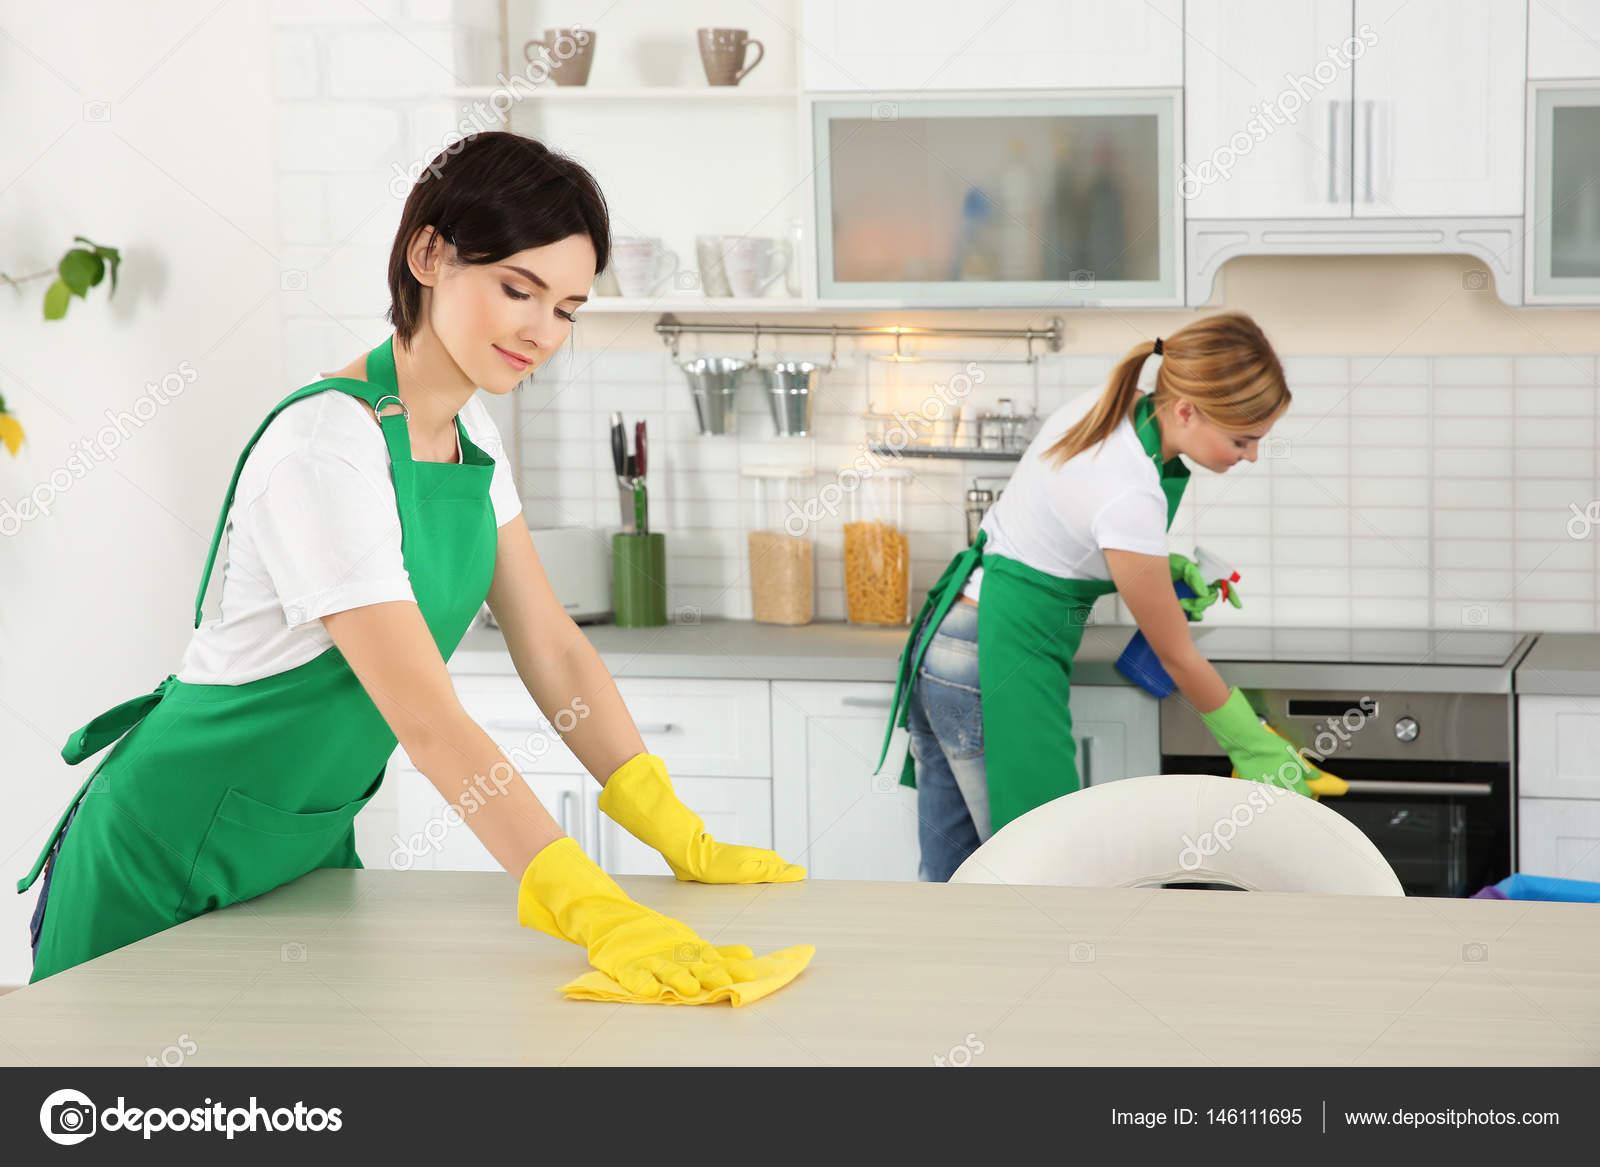 Housekeeping team reinigung k che stockfoto belchonock 146111695 - Pulizia cucina ristorante ...